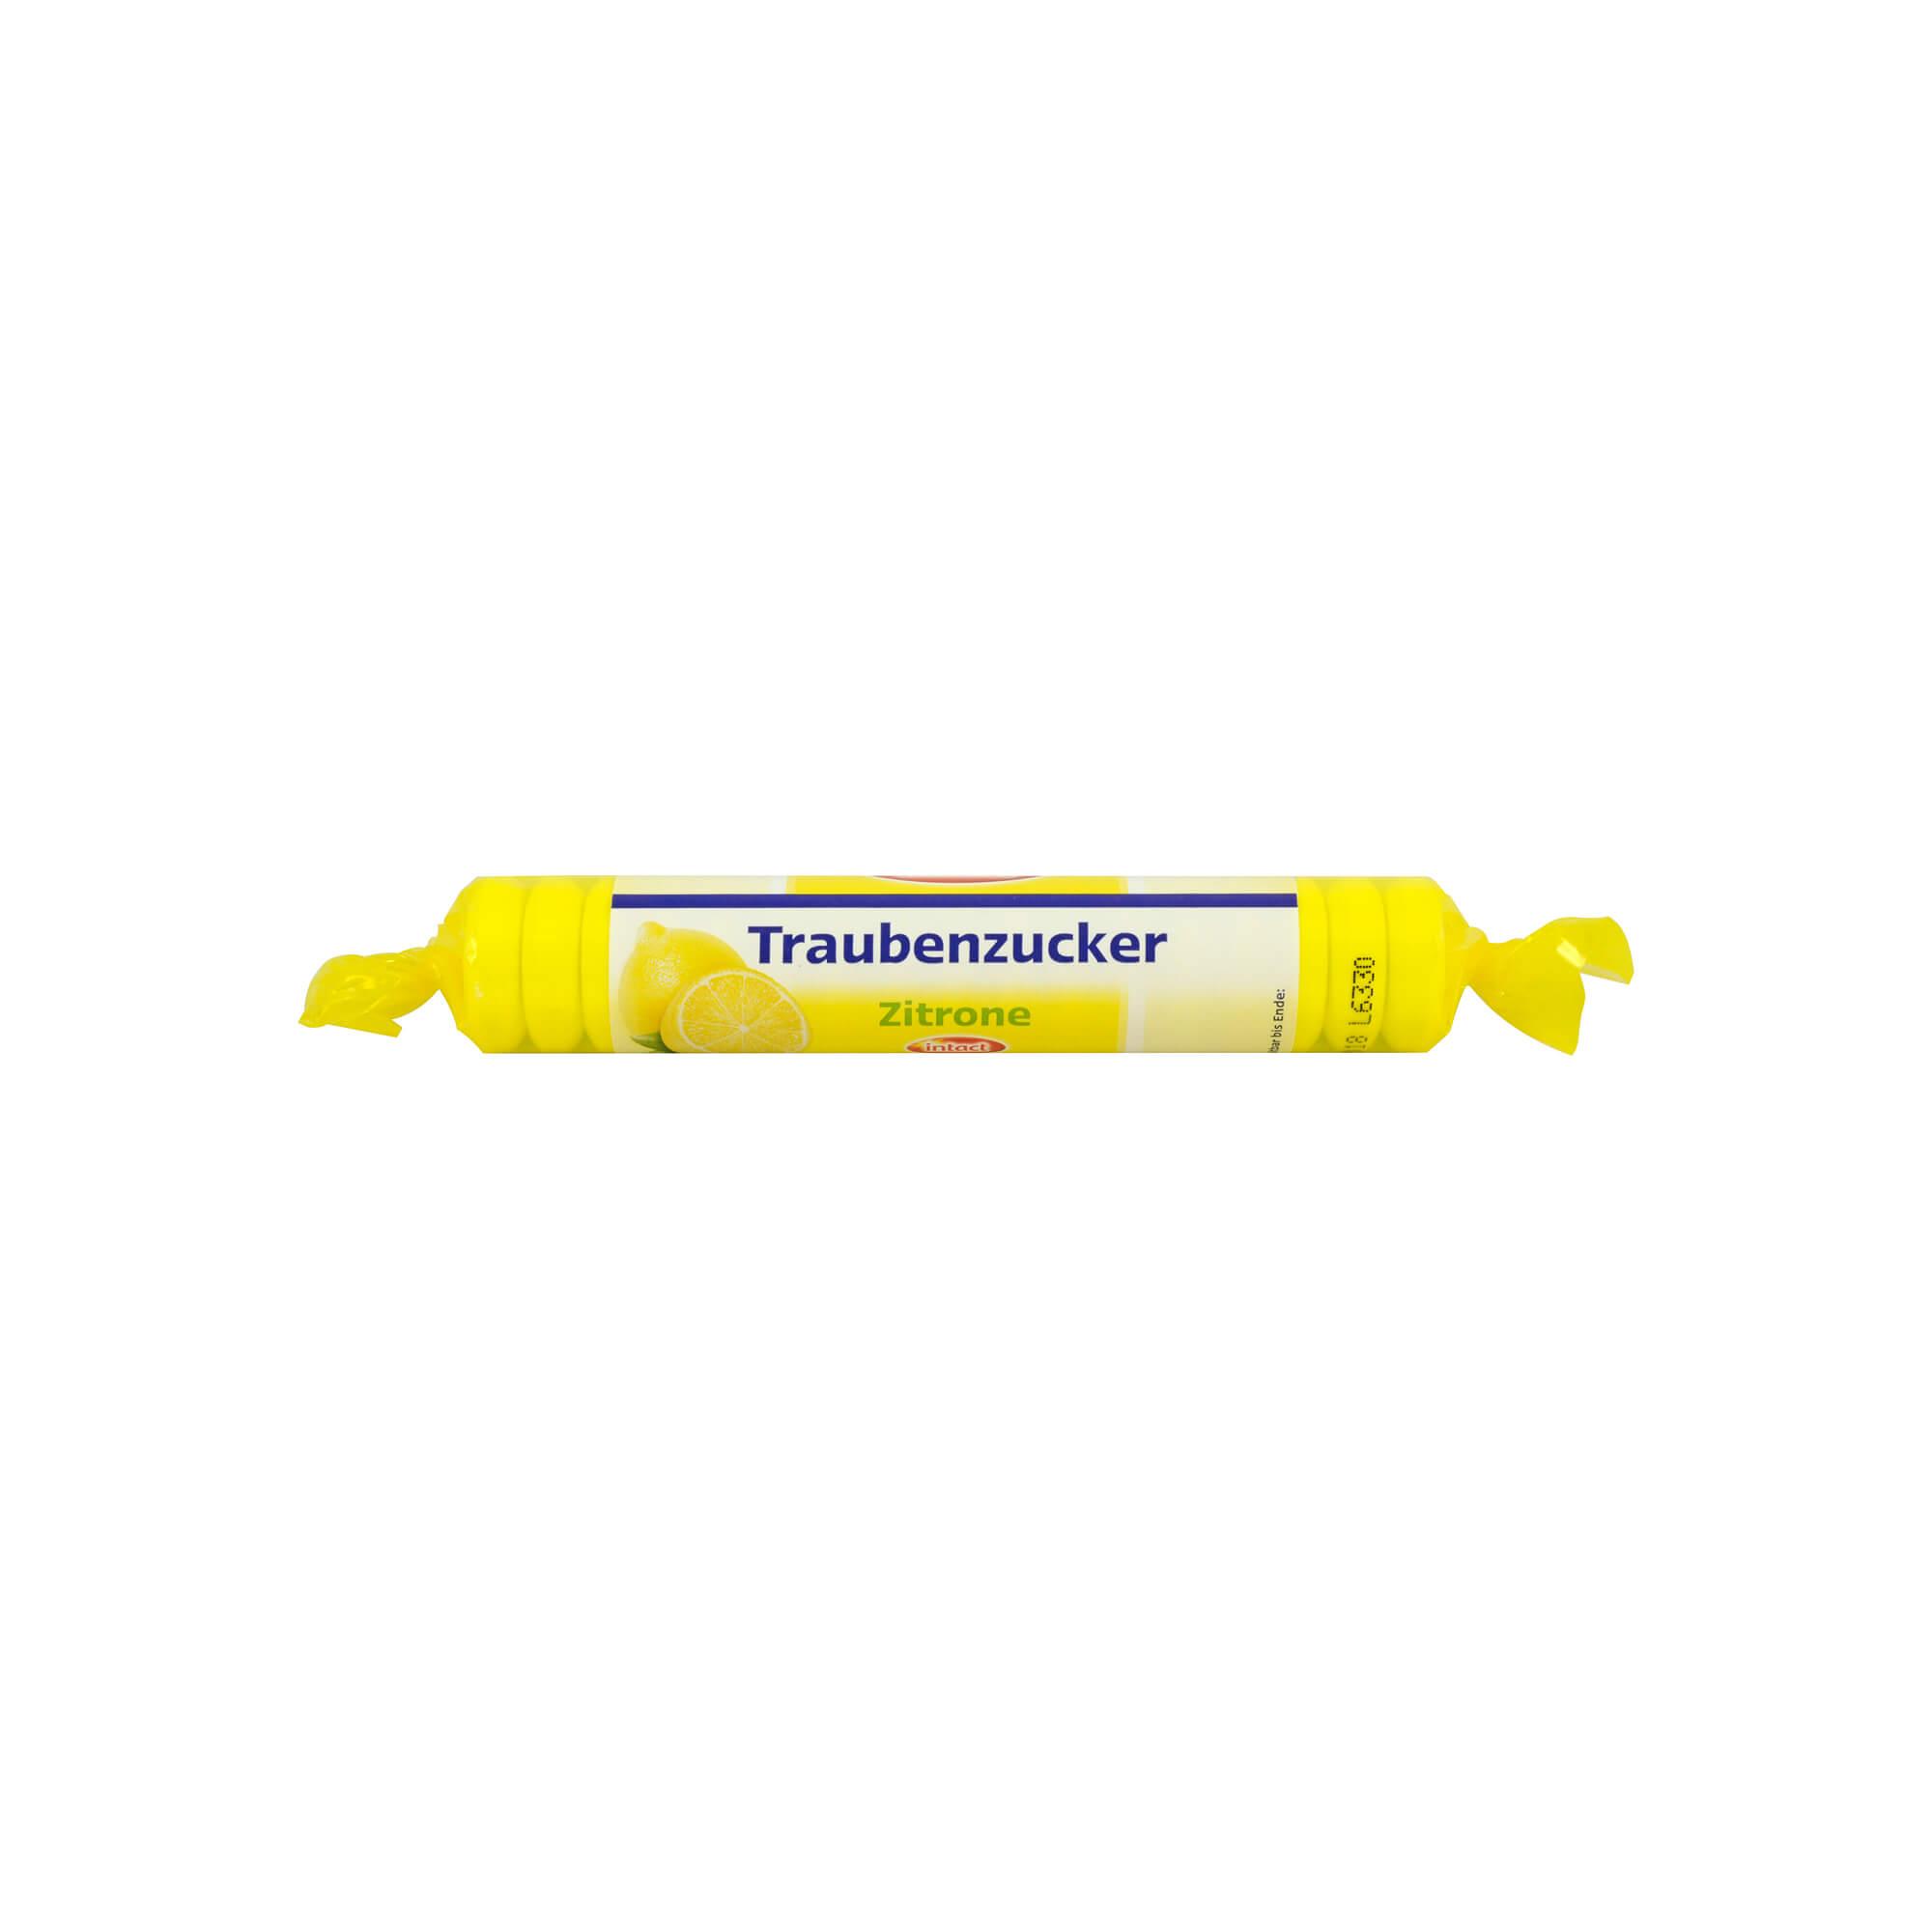 Intact Traubenzucker Zitrone Rolle